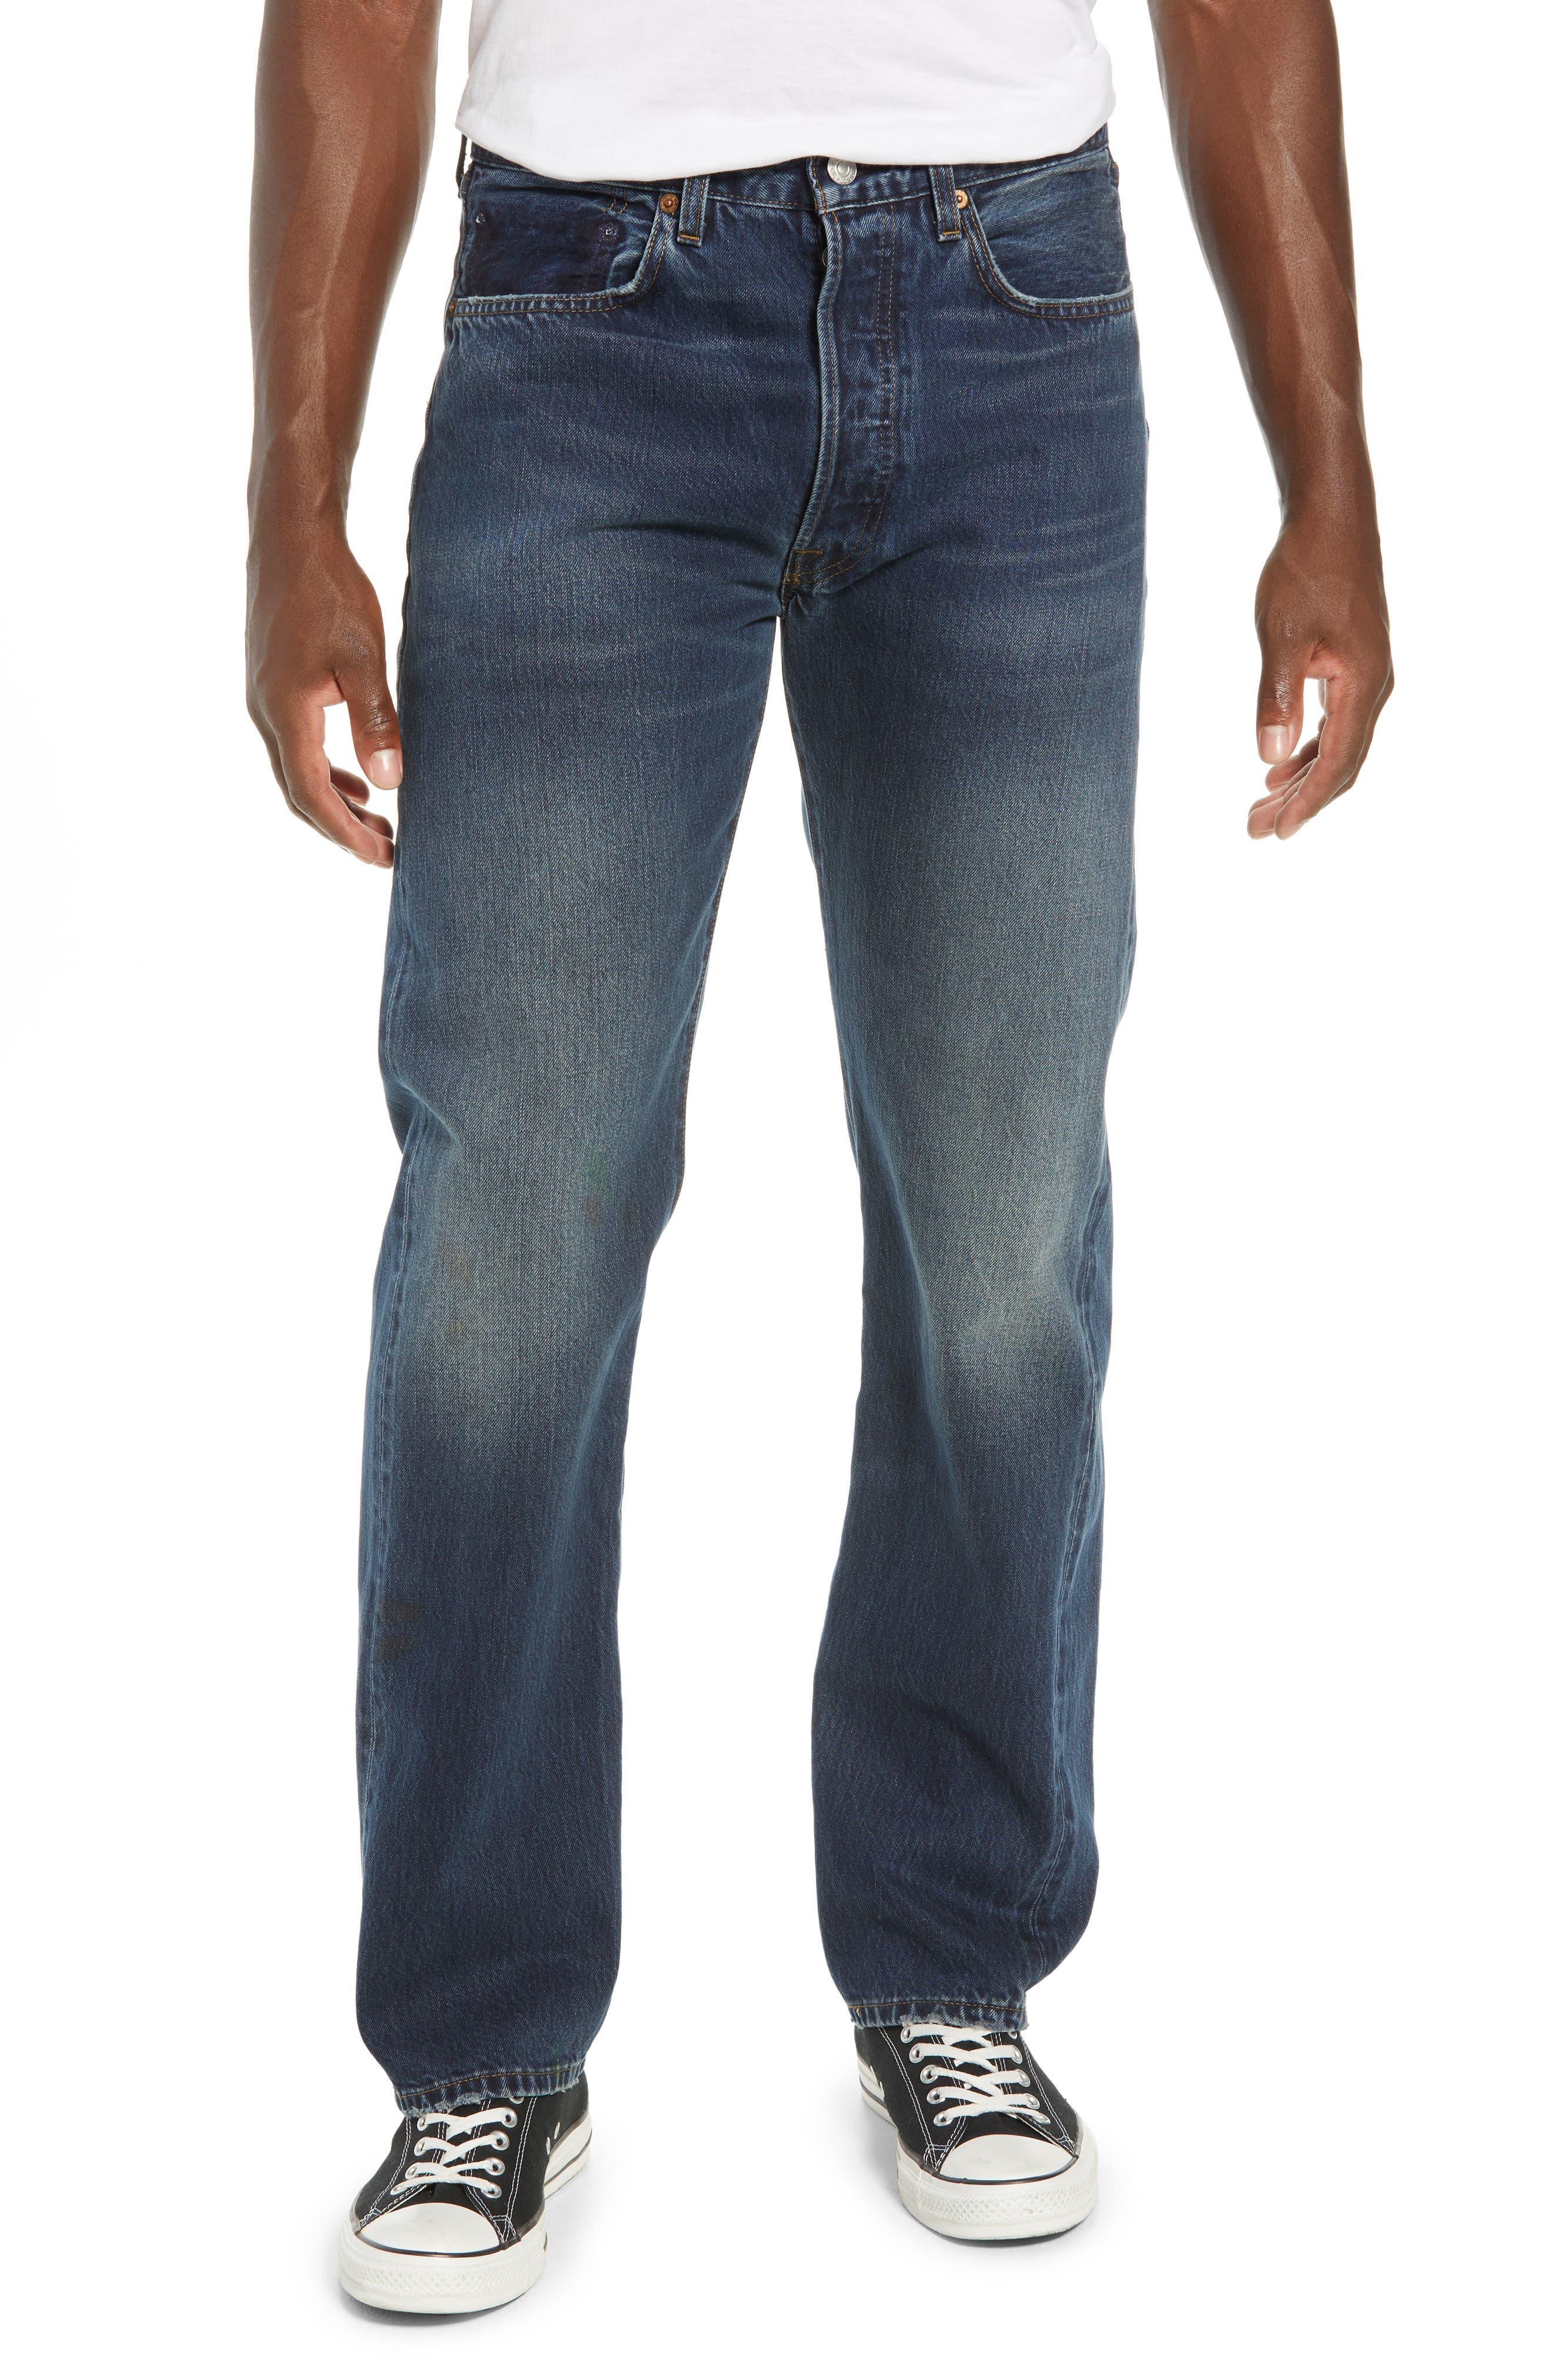 Levi's<sup>®</sup> 1967 501<sup>®</sup> Slim Fit Jeans,                             Main thumbnail 1, color,                             402